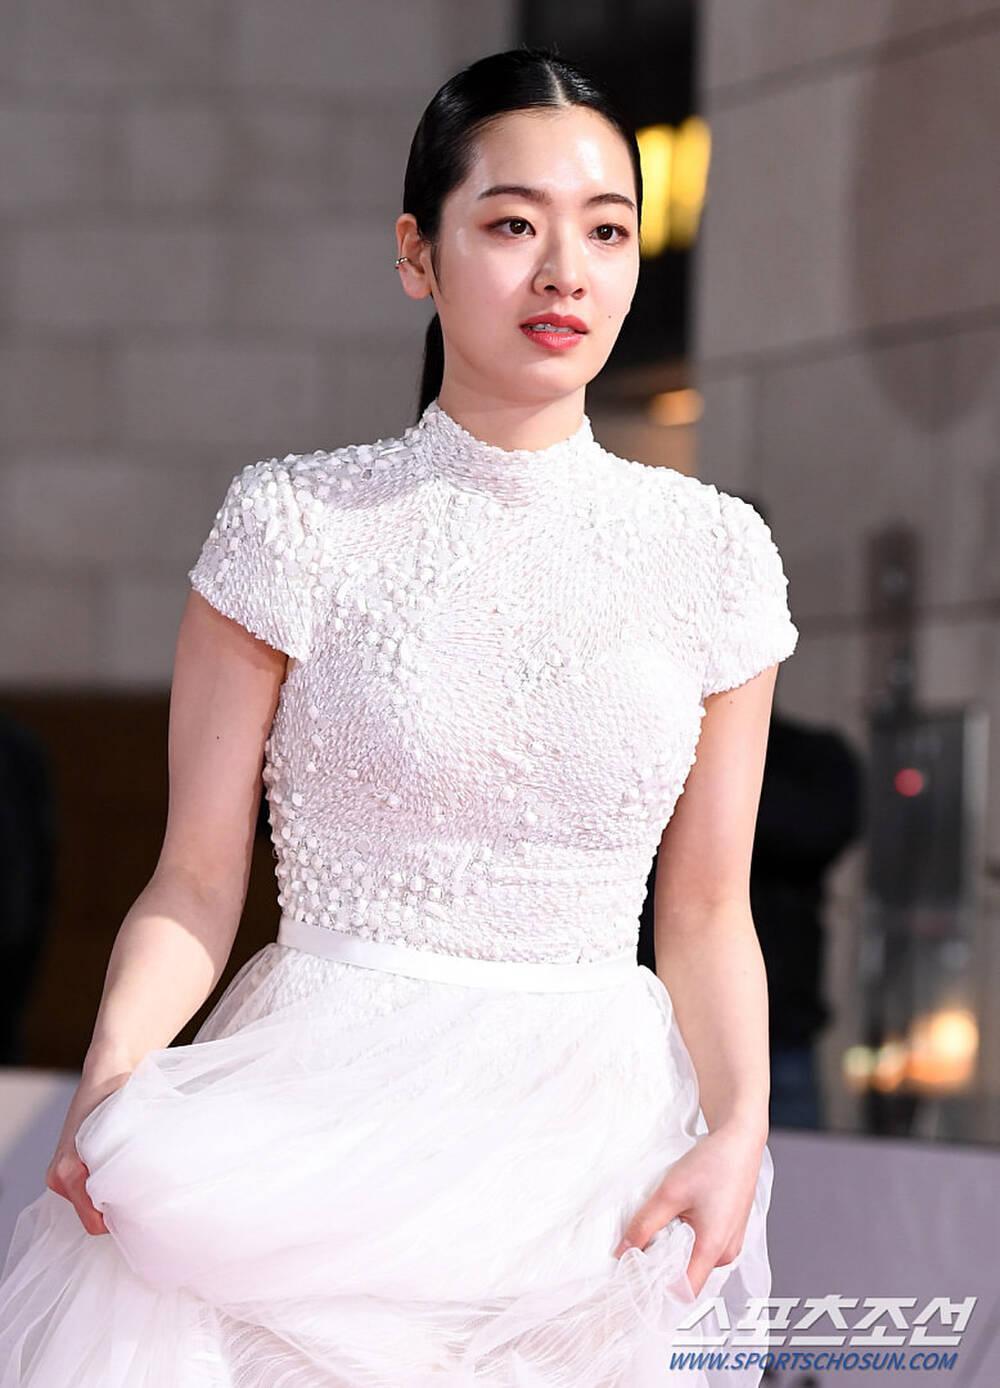 Thảm đỏ 'Rồng xanh 2020': Shin Hye Sun 'cân sắc' Shin Min Ah, Jung Woo Sung - Lee Byung Hun điển trai! Ảnh 44